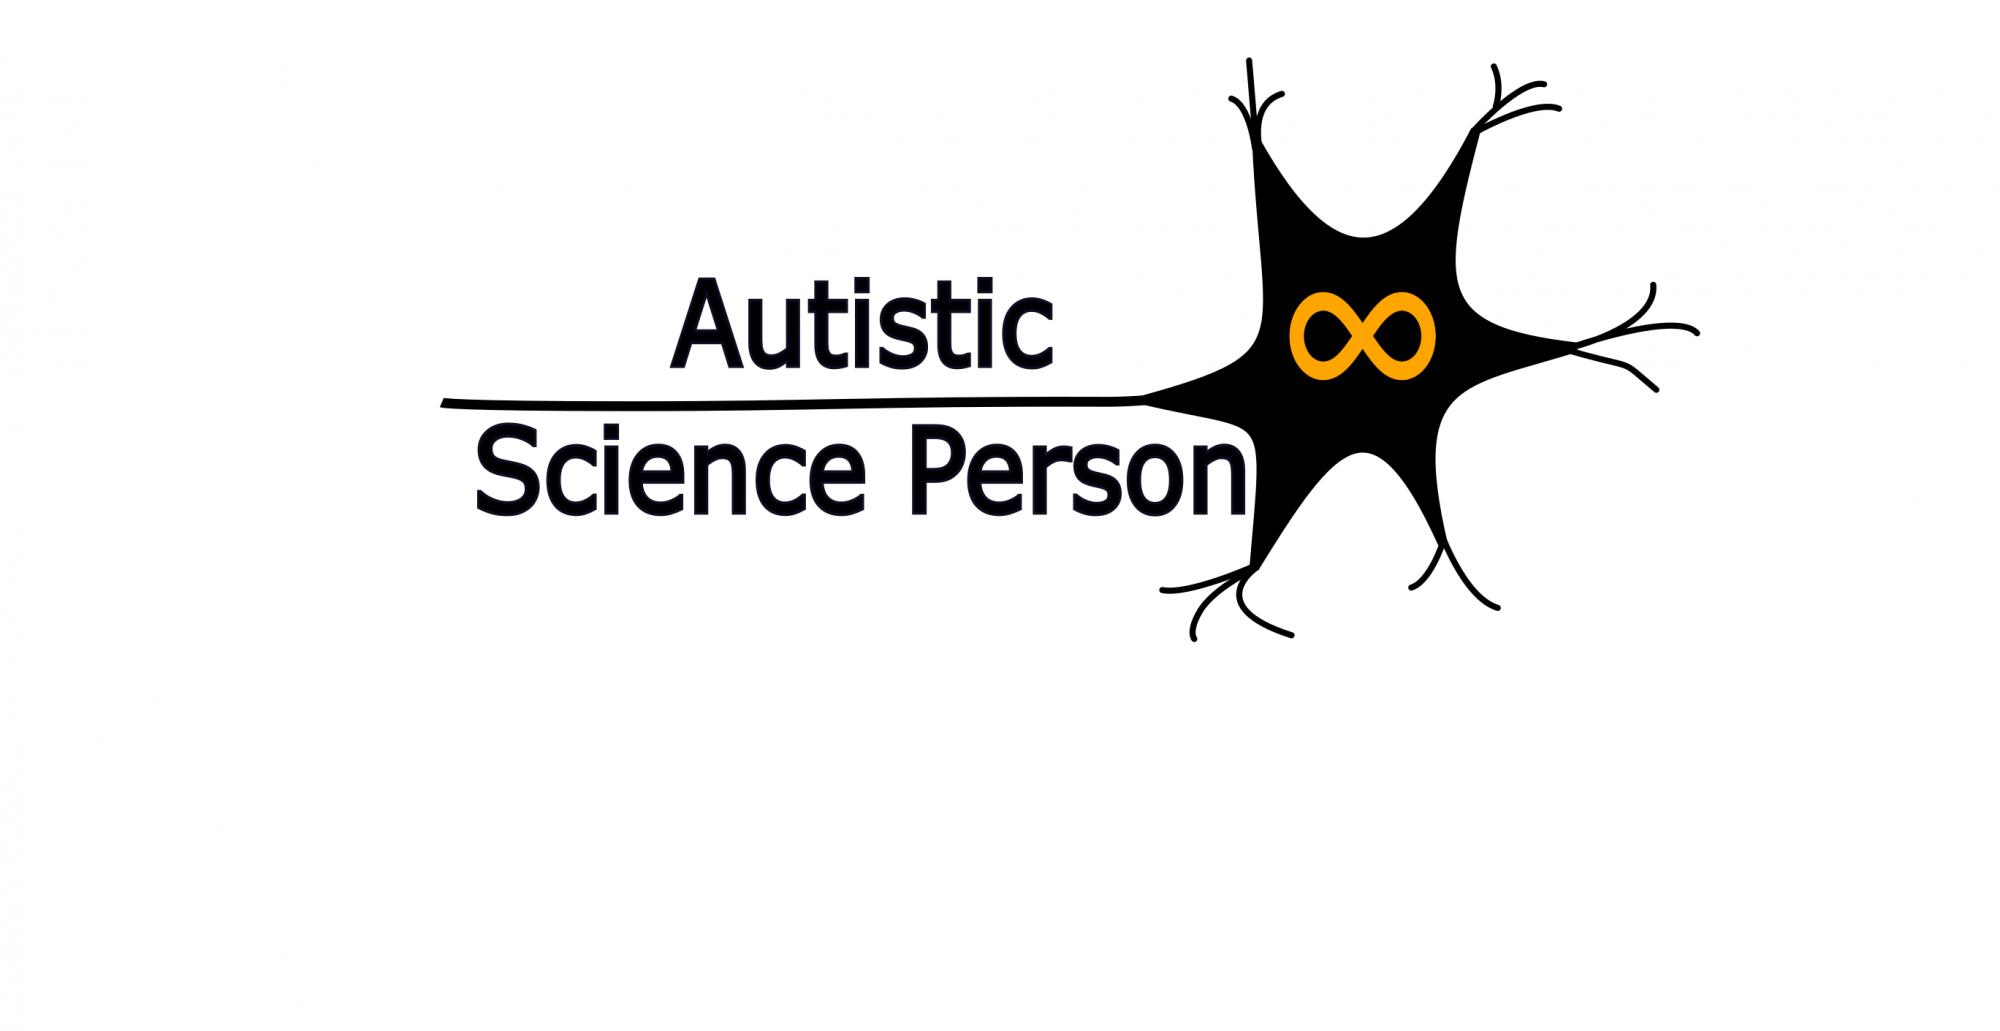 Autistic Science Person